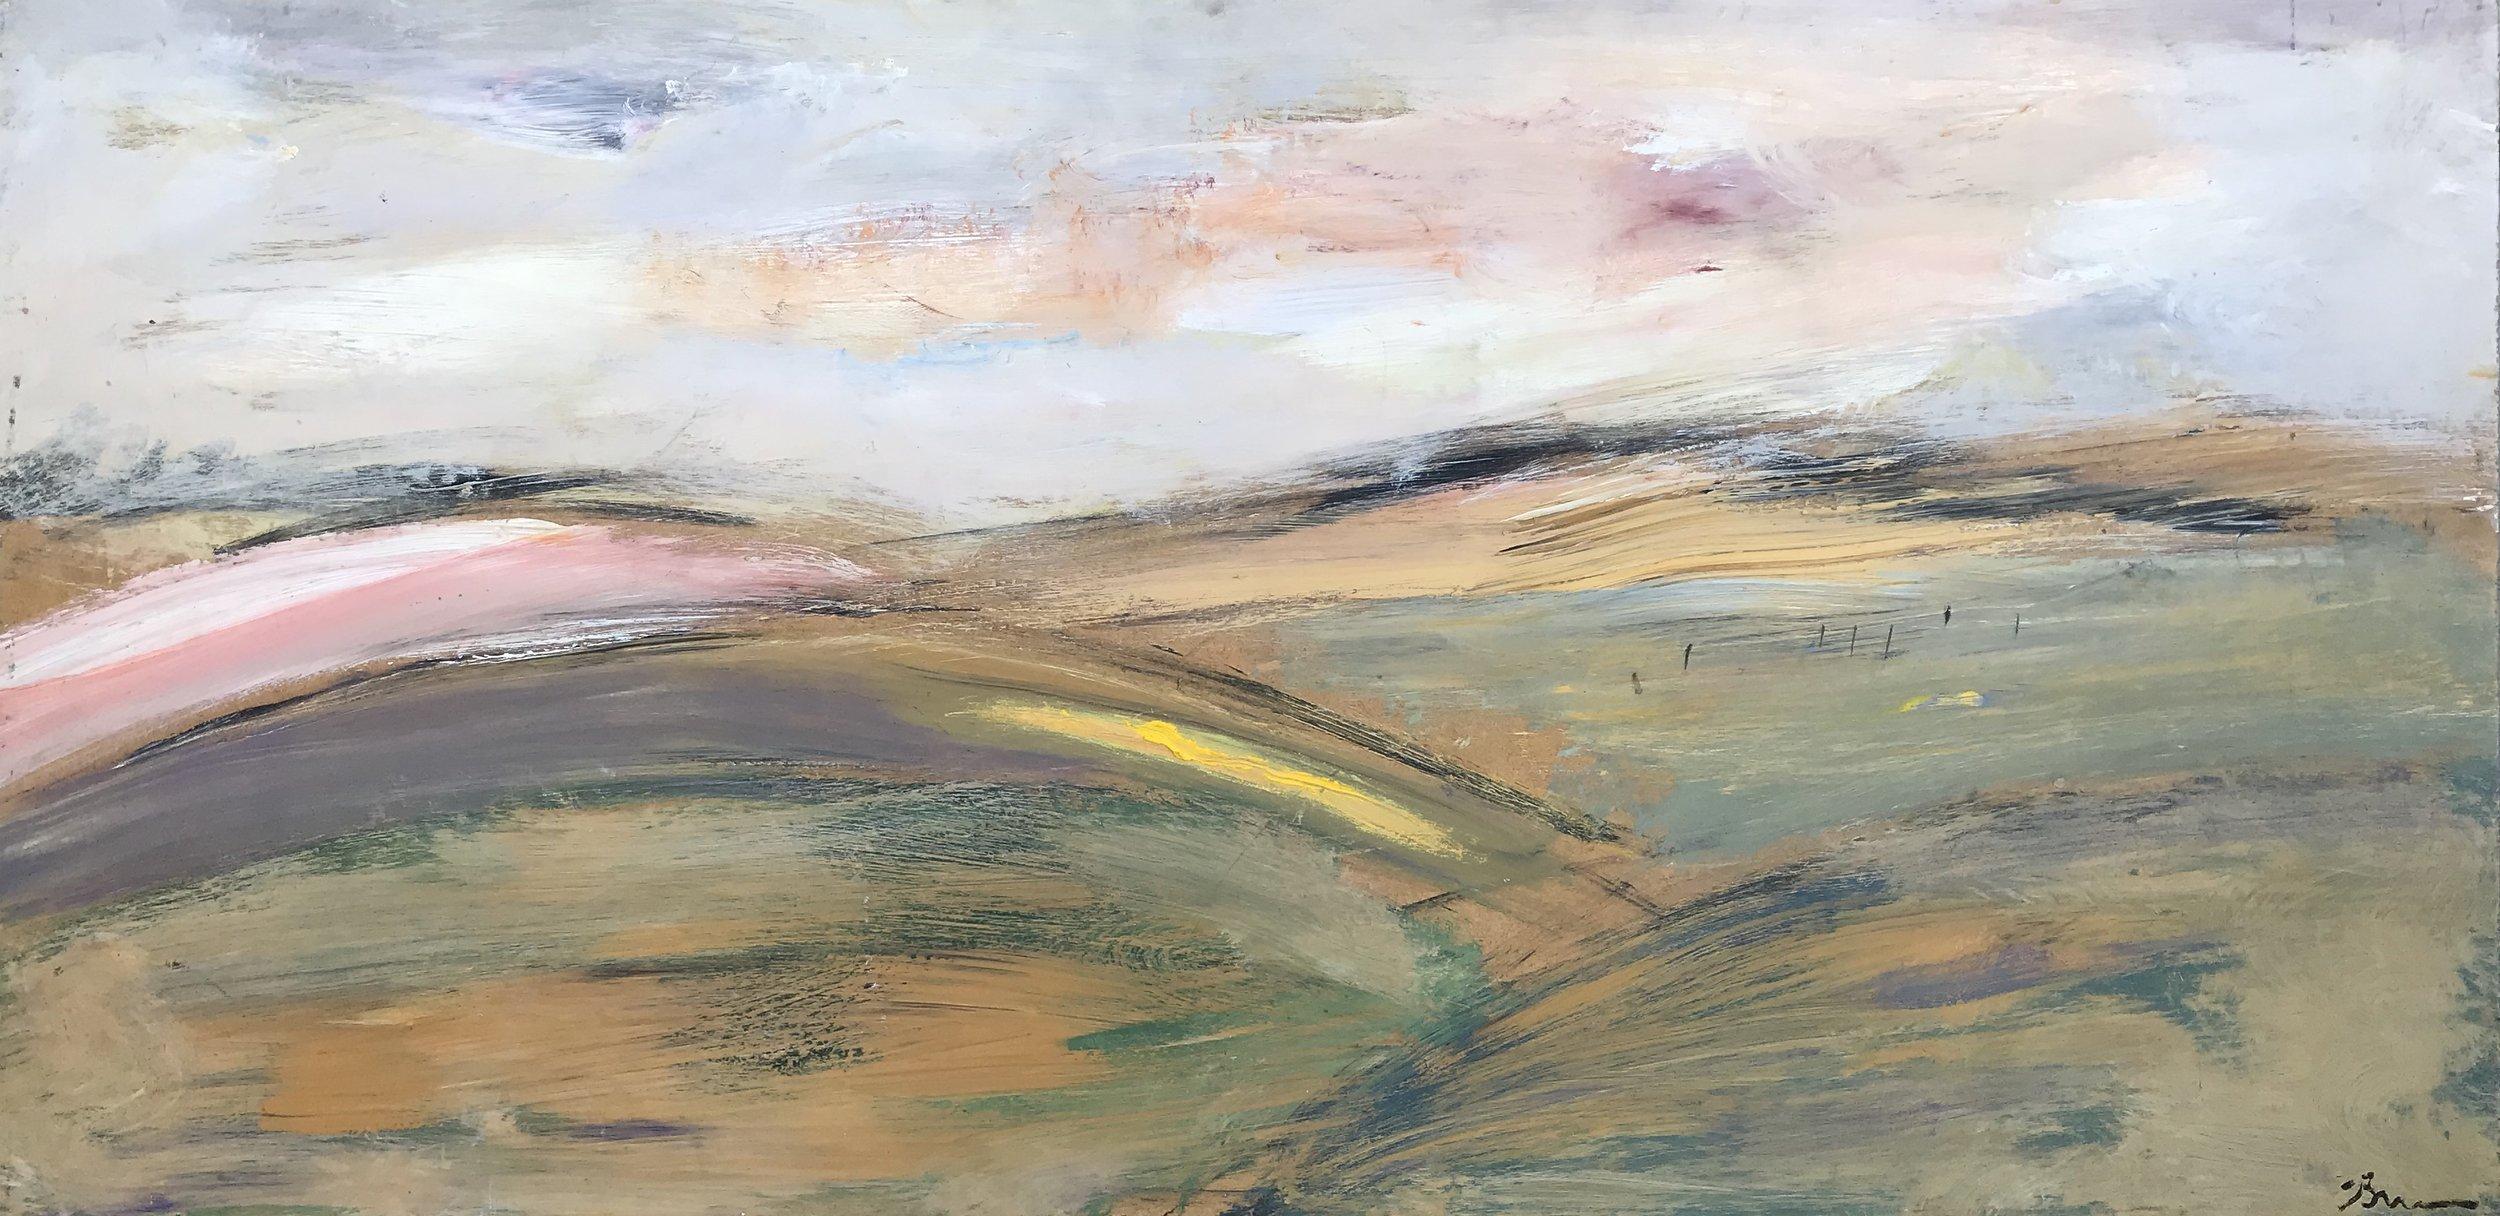 """Summer's Eve"" - 24"" x 48"" x 3 3/4"", oil on panelValue: $4,700Opening bid: $1,850email your bid to: art@bradfordbrenner.com"